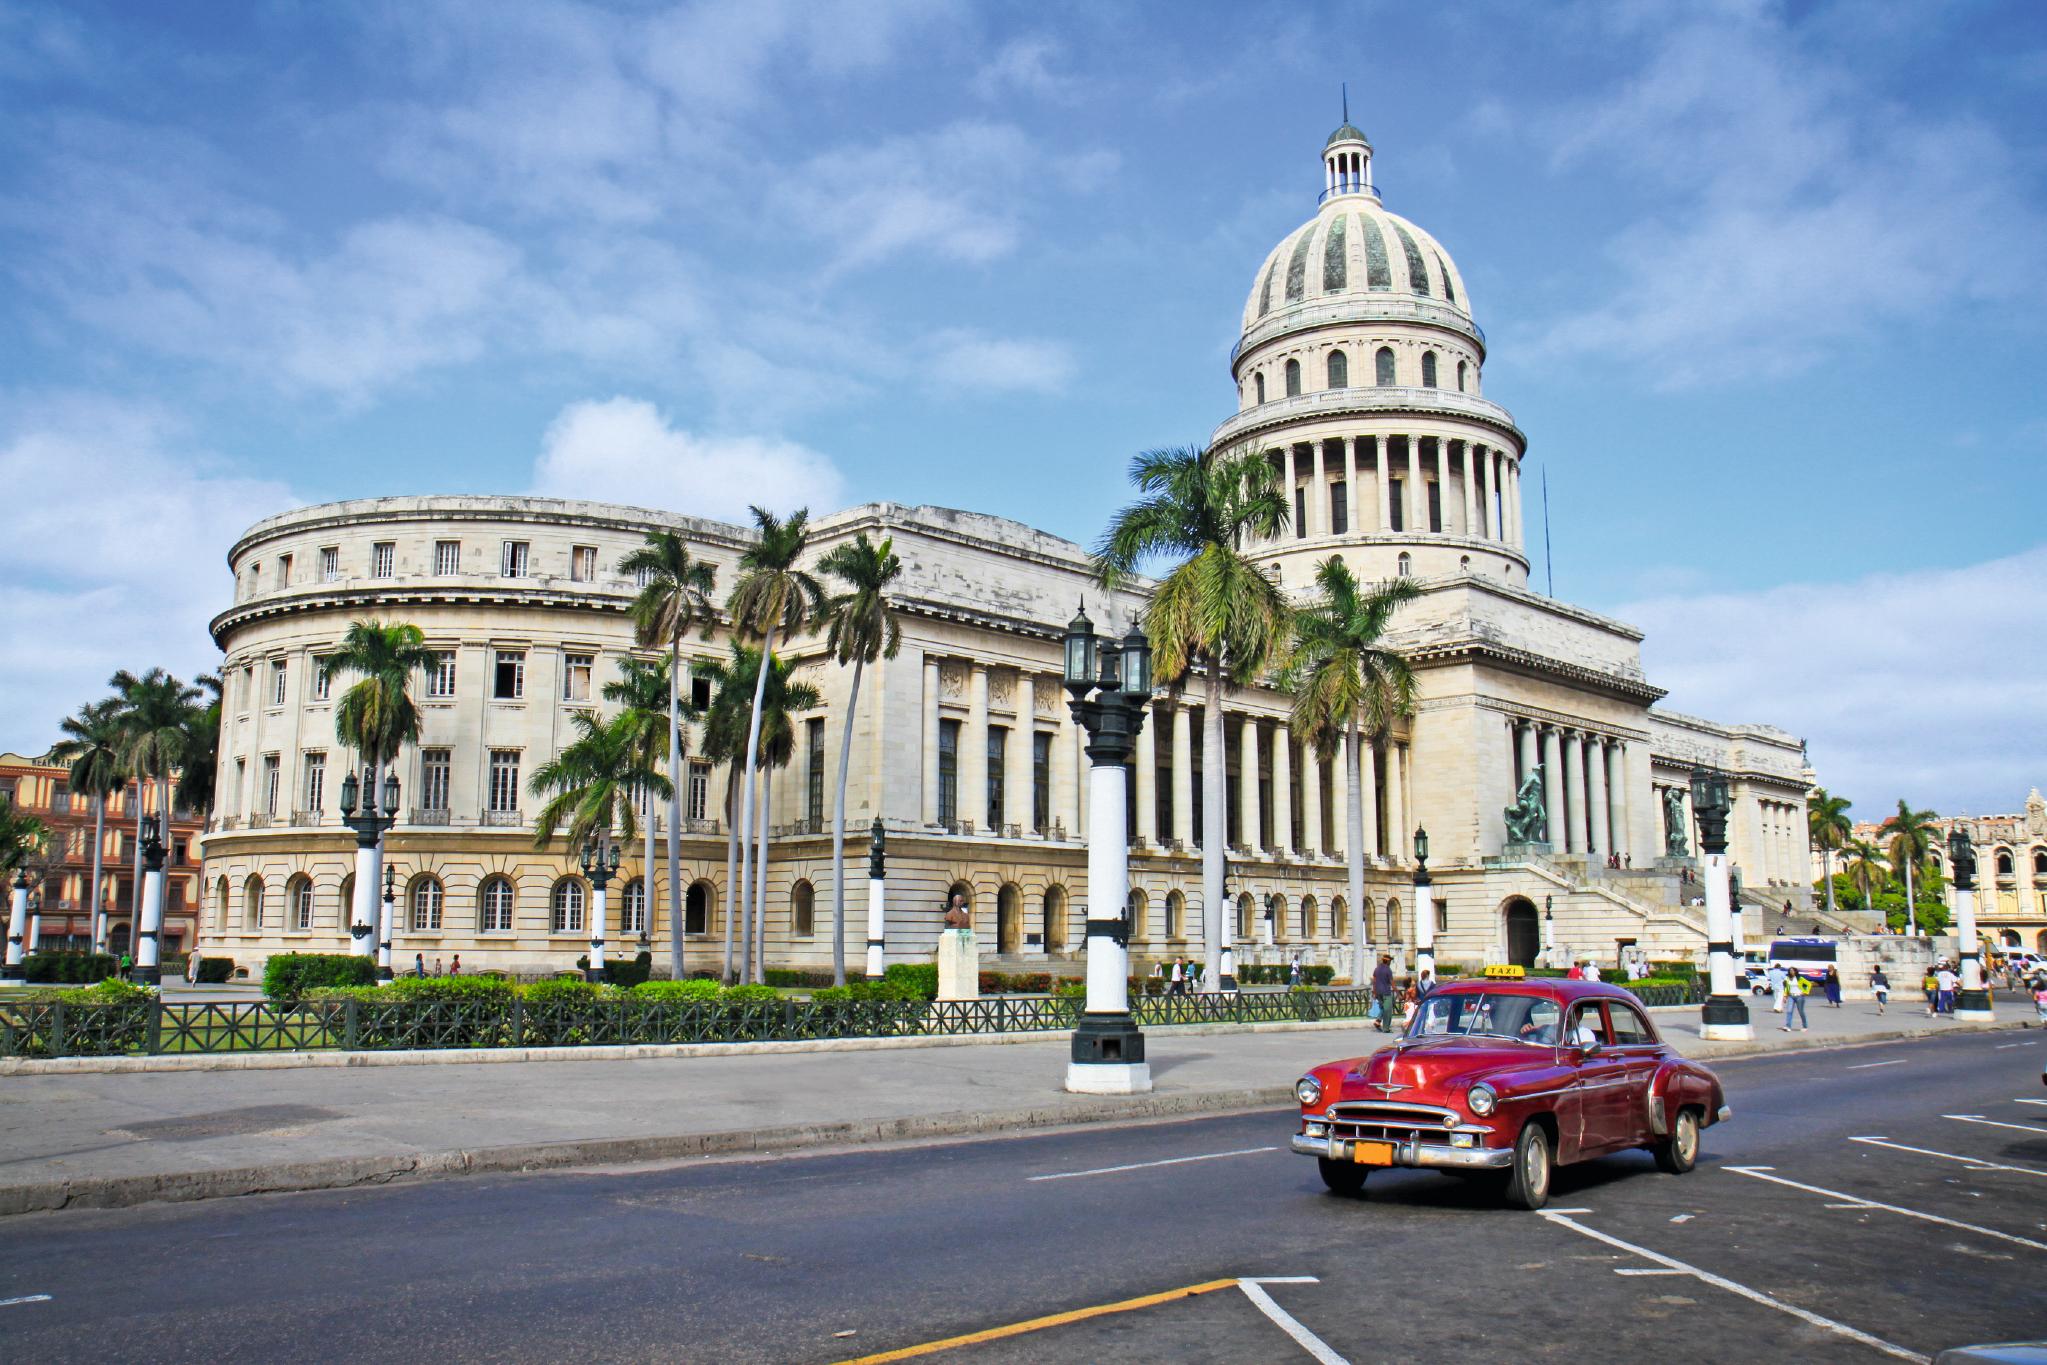 Kuba havanna kapitol.jpeg